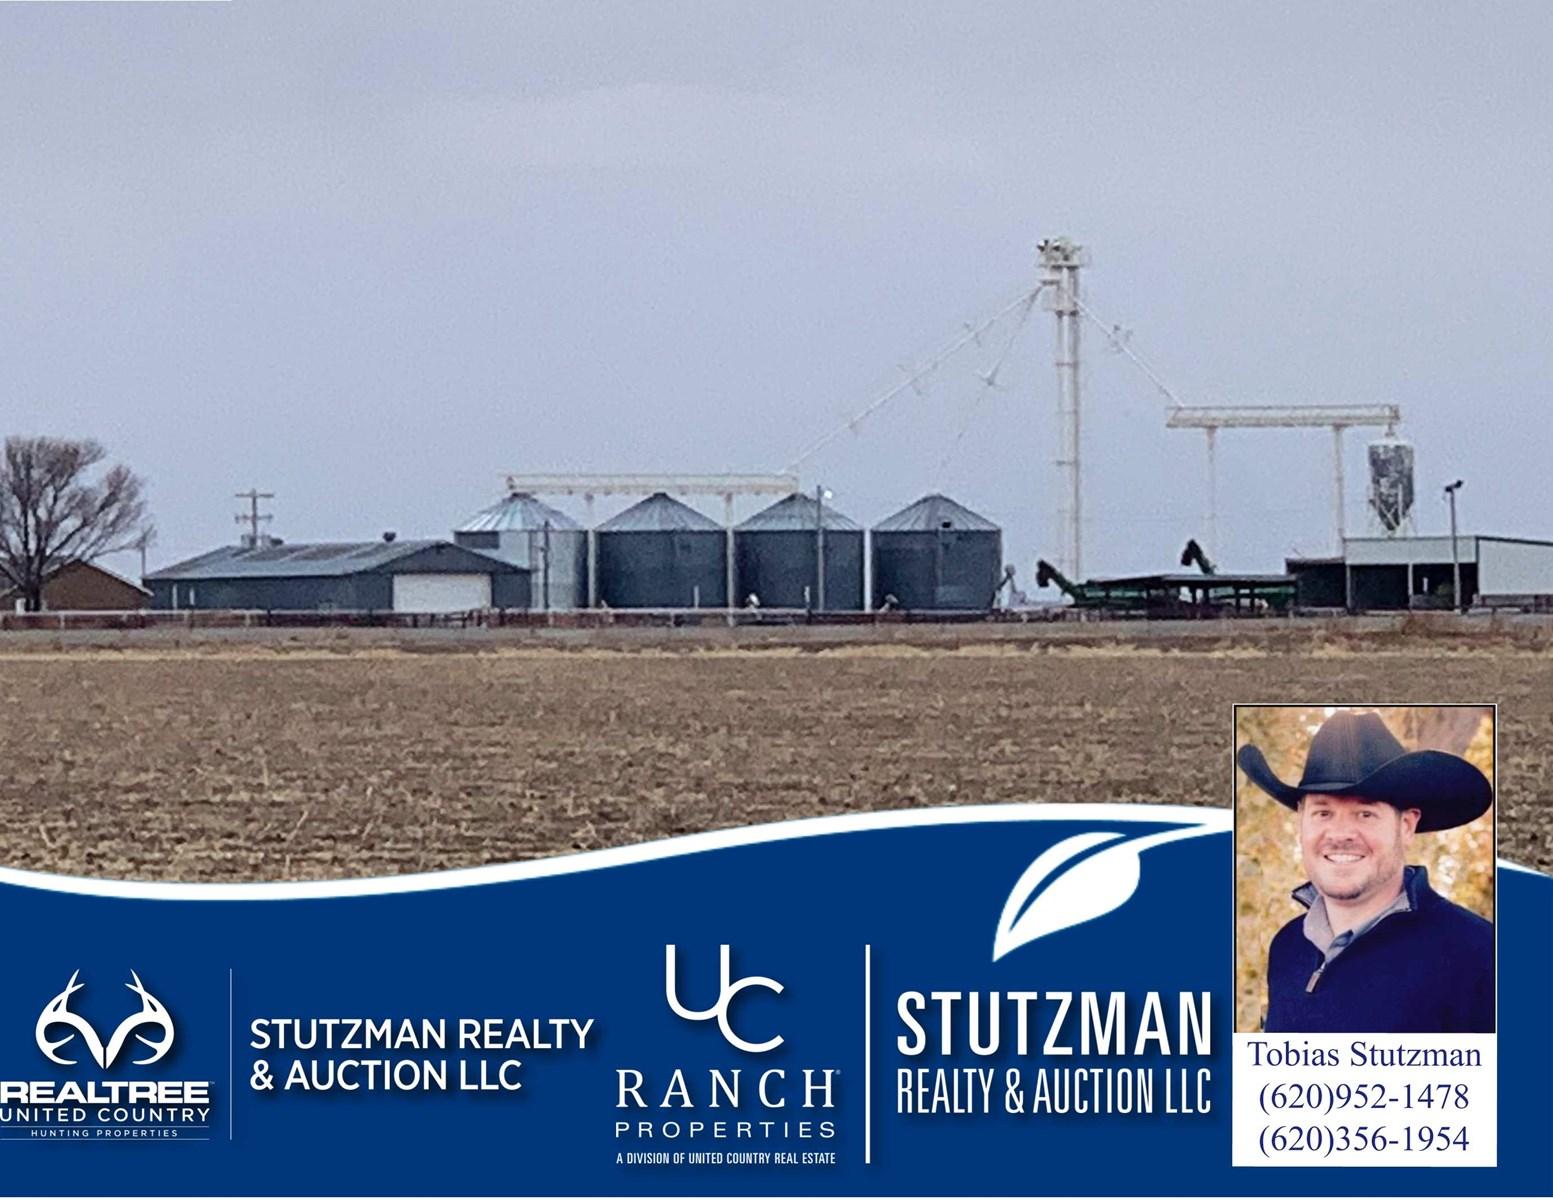 SW KS - Stutzman Realty & Auction